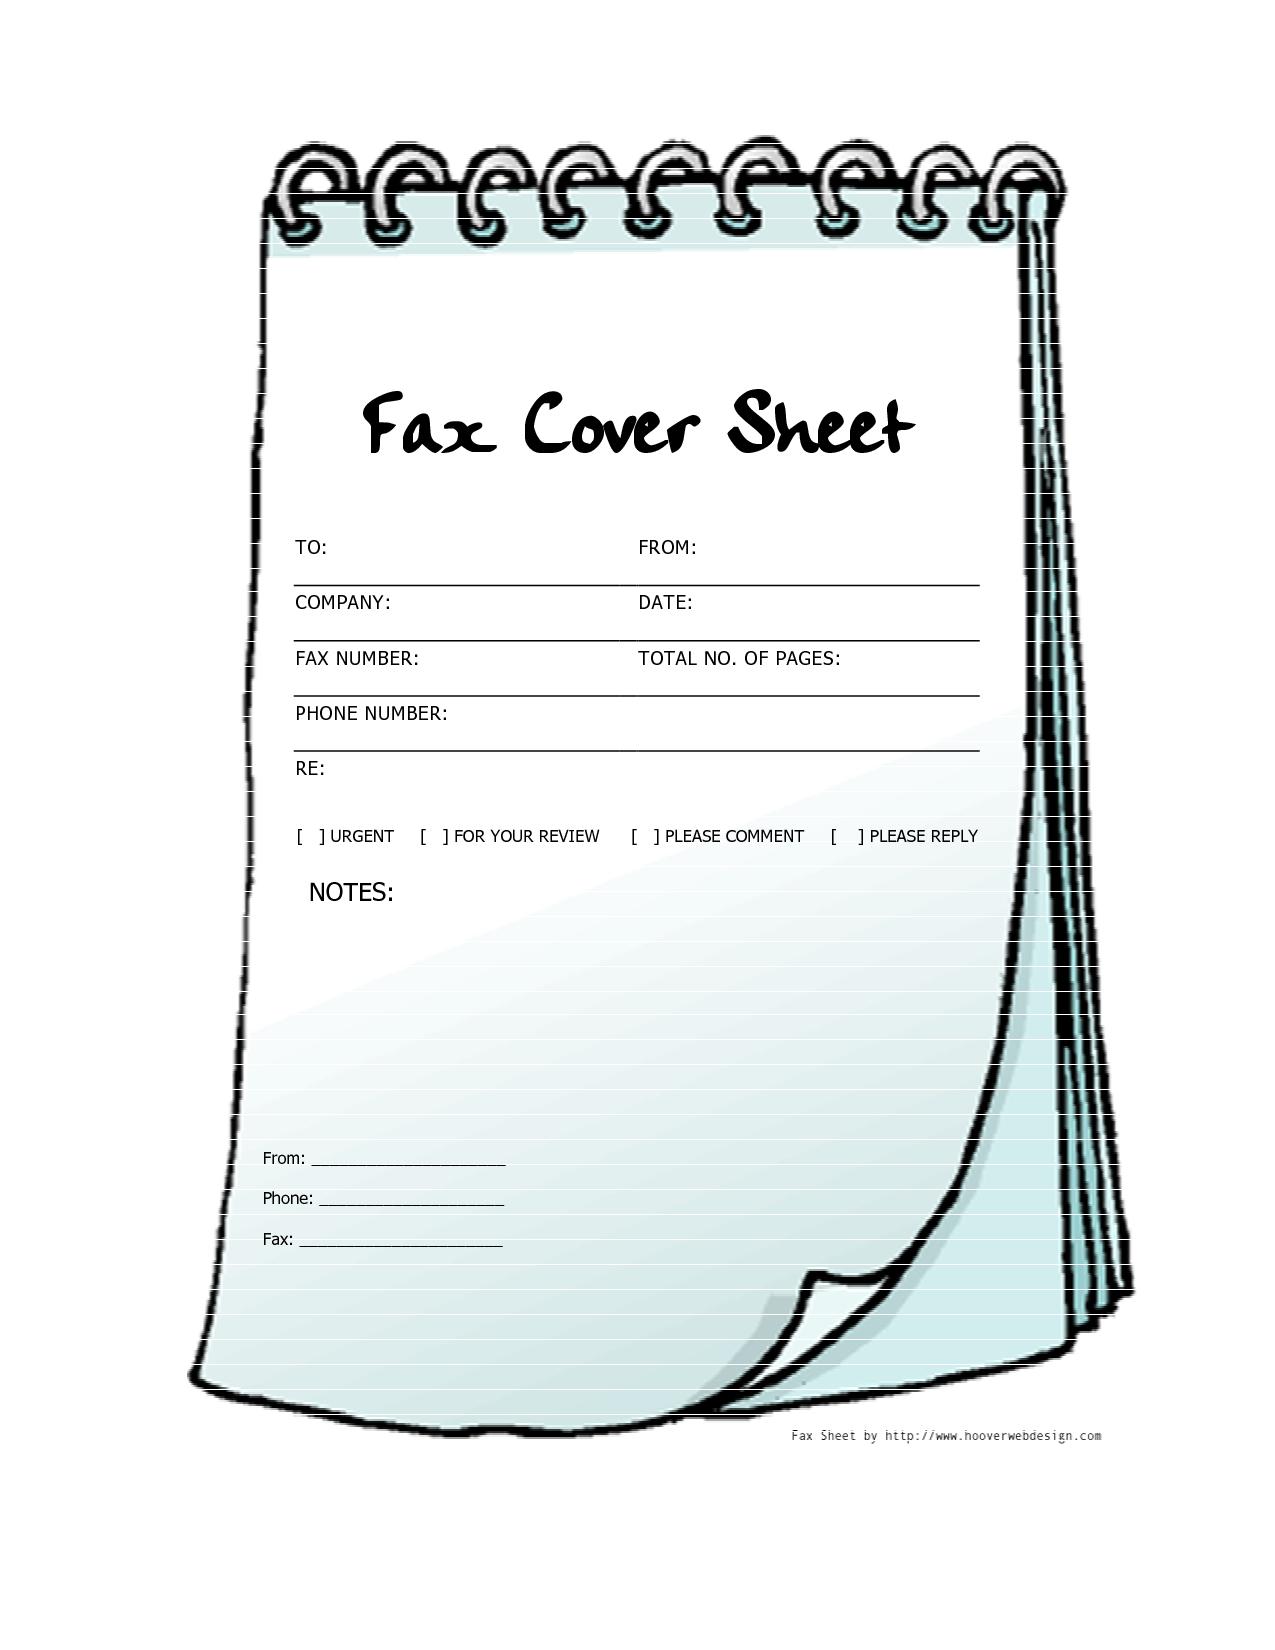 Free Printable Fax Cover Sheets | Free Printable Fax Cover Sheet - Free Printable Fax Cover Sheet